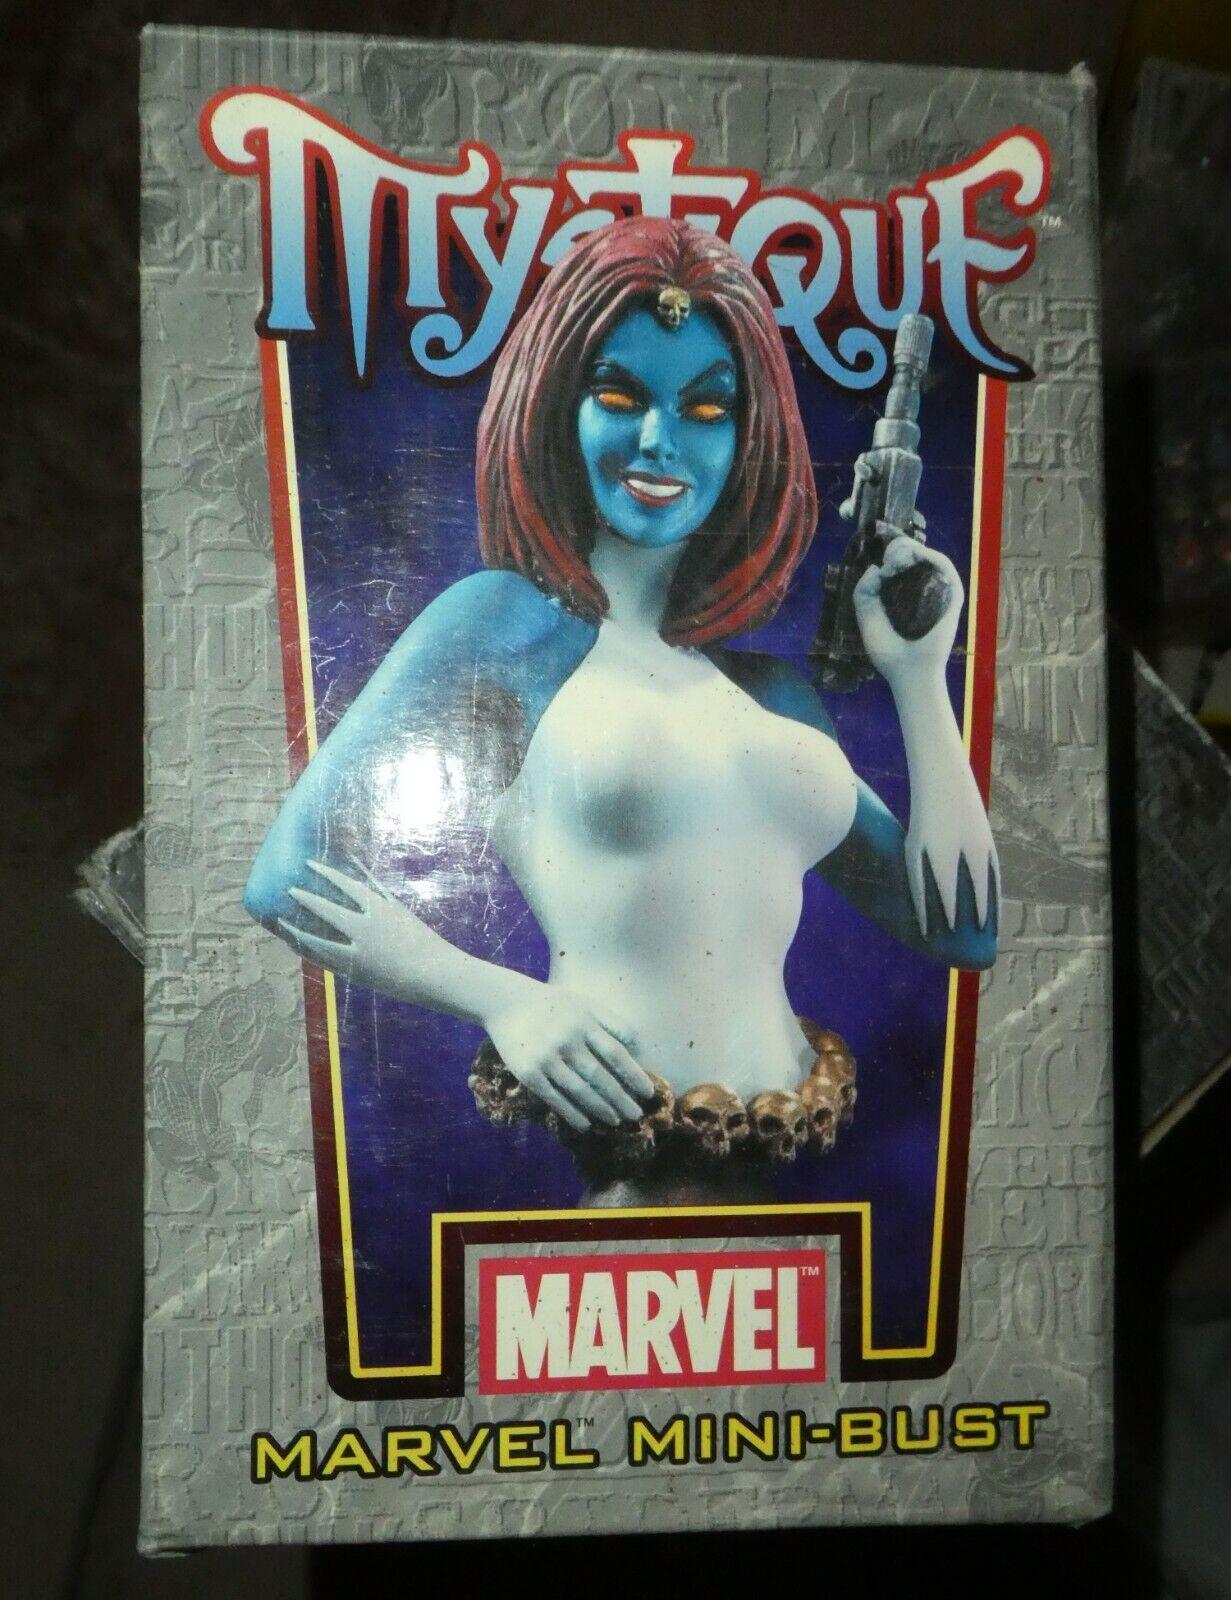 Bowen Marvel Mystique hombres Busto Comic Figura En Caja Edición Limitada 3000 Magneto